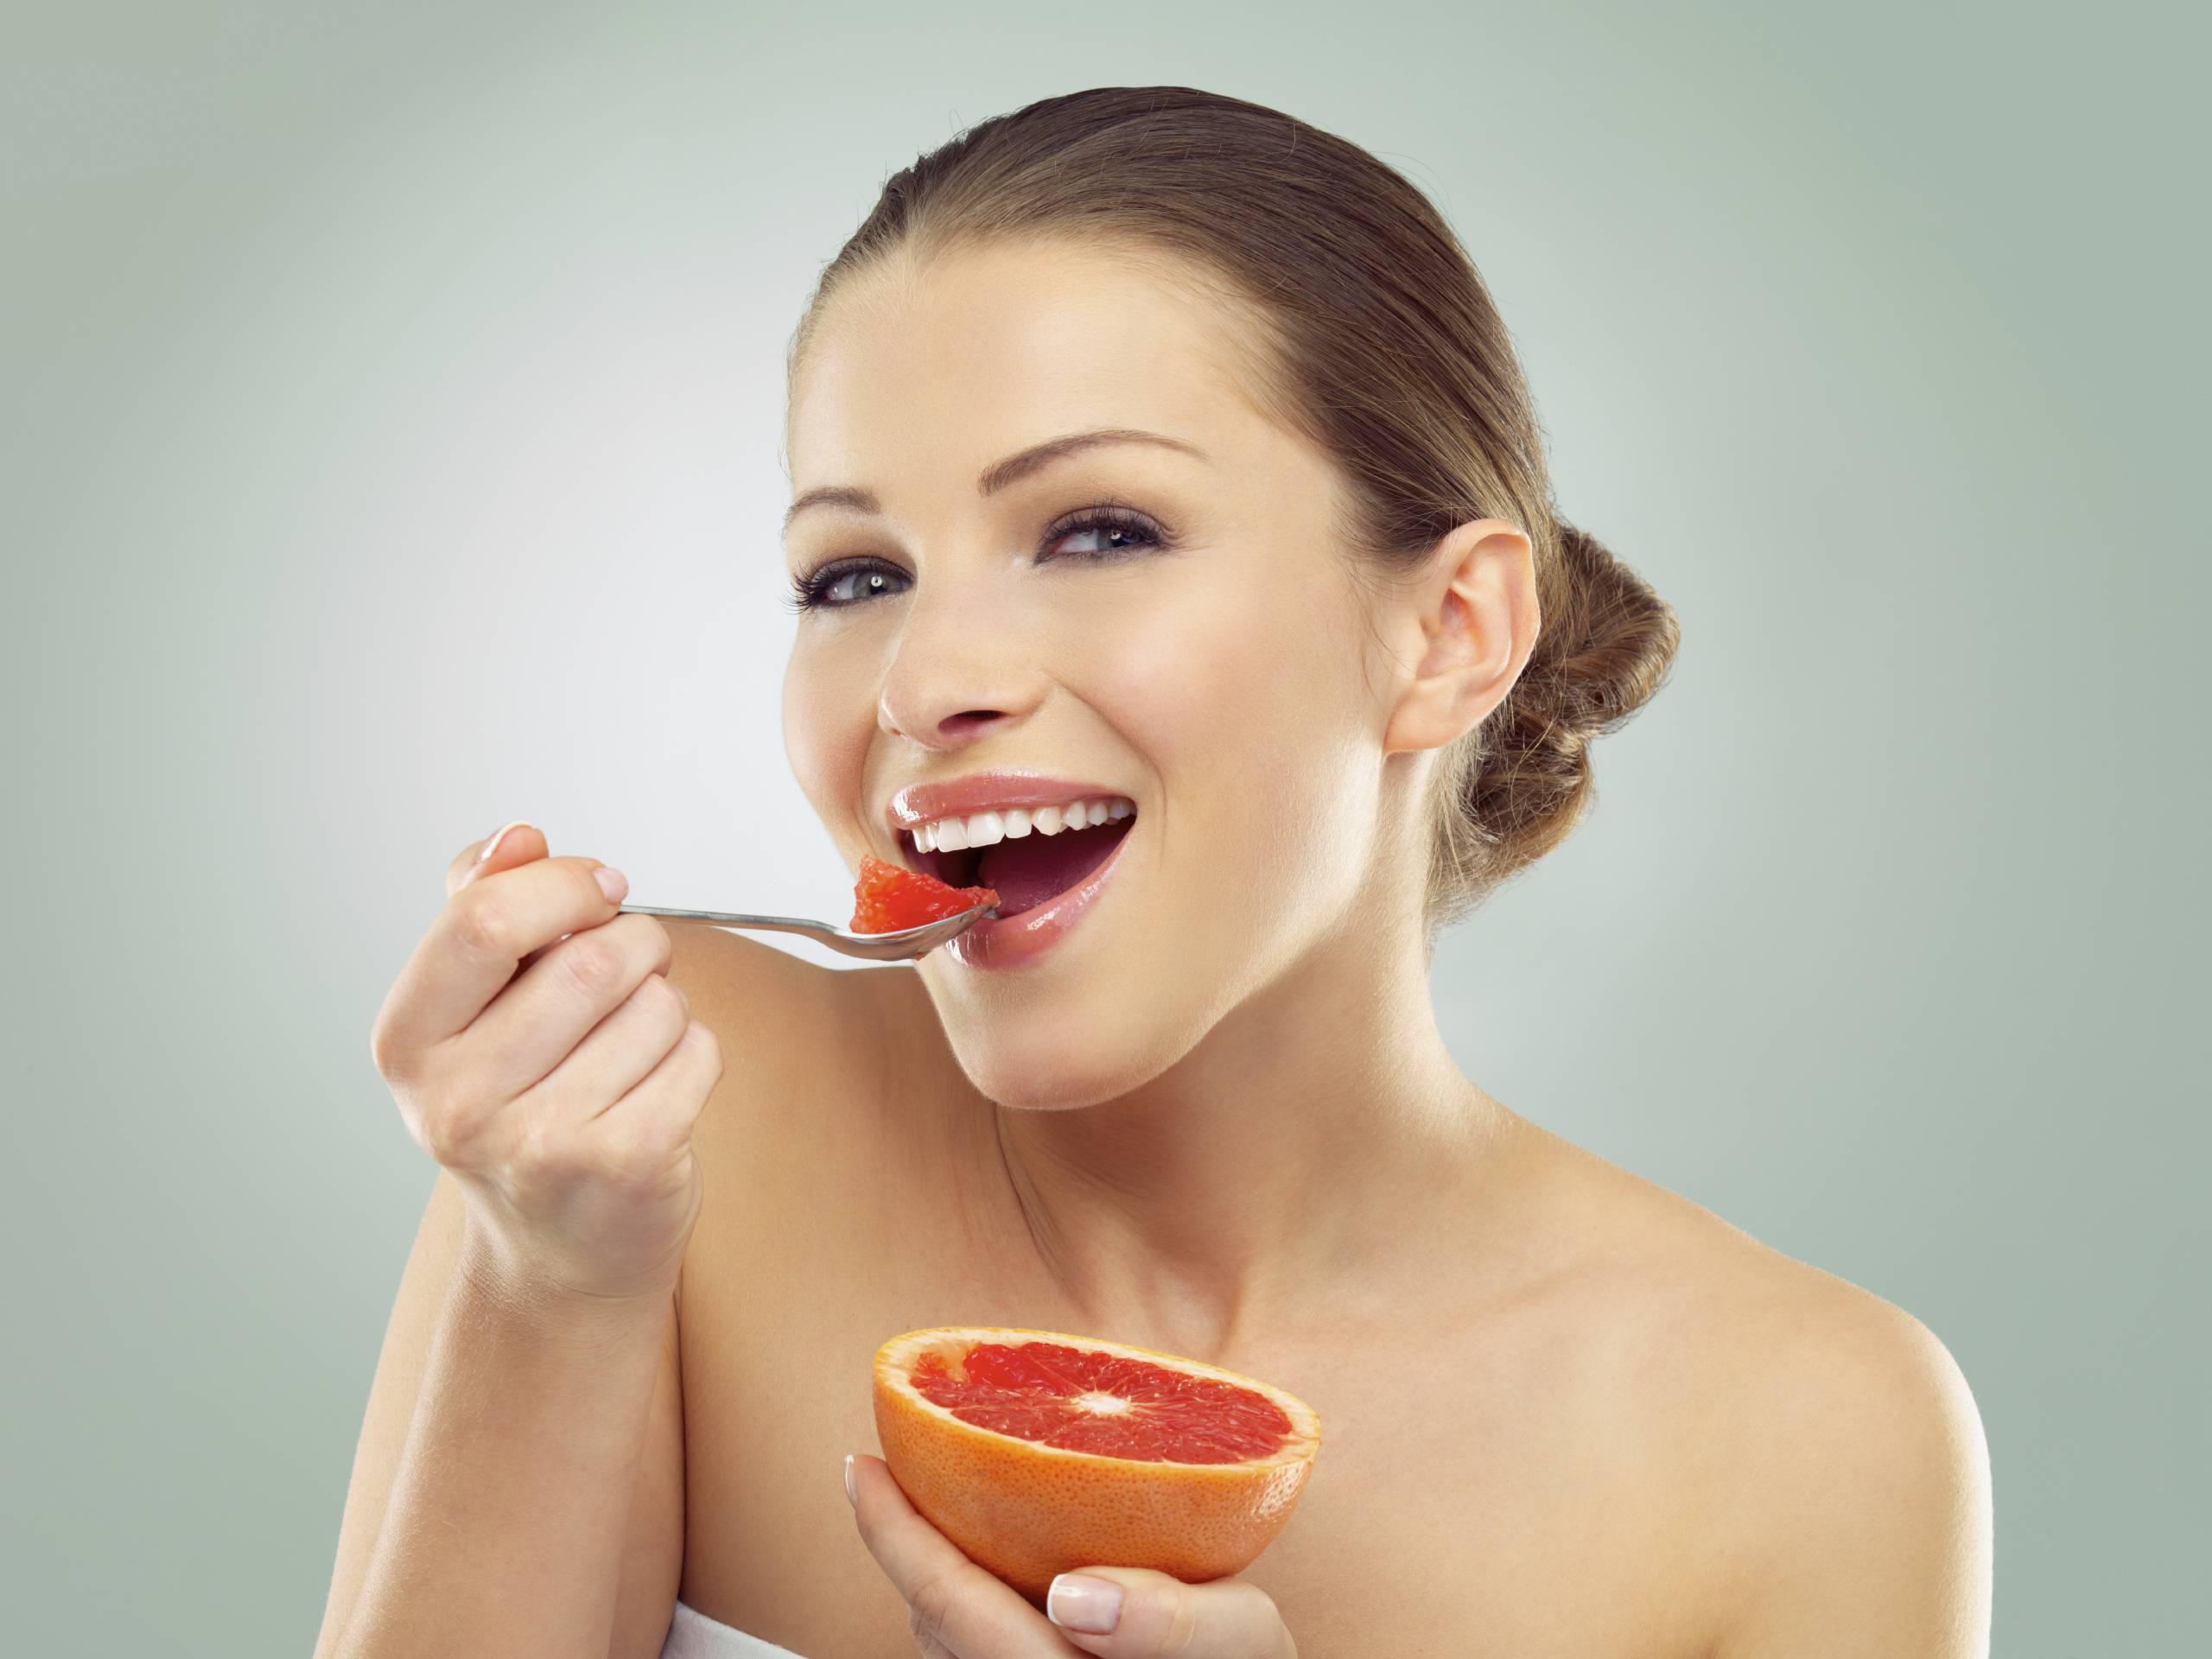 bere succo d arancia per perdere peso